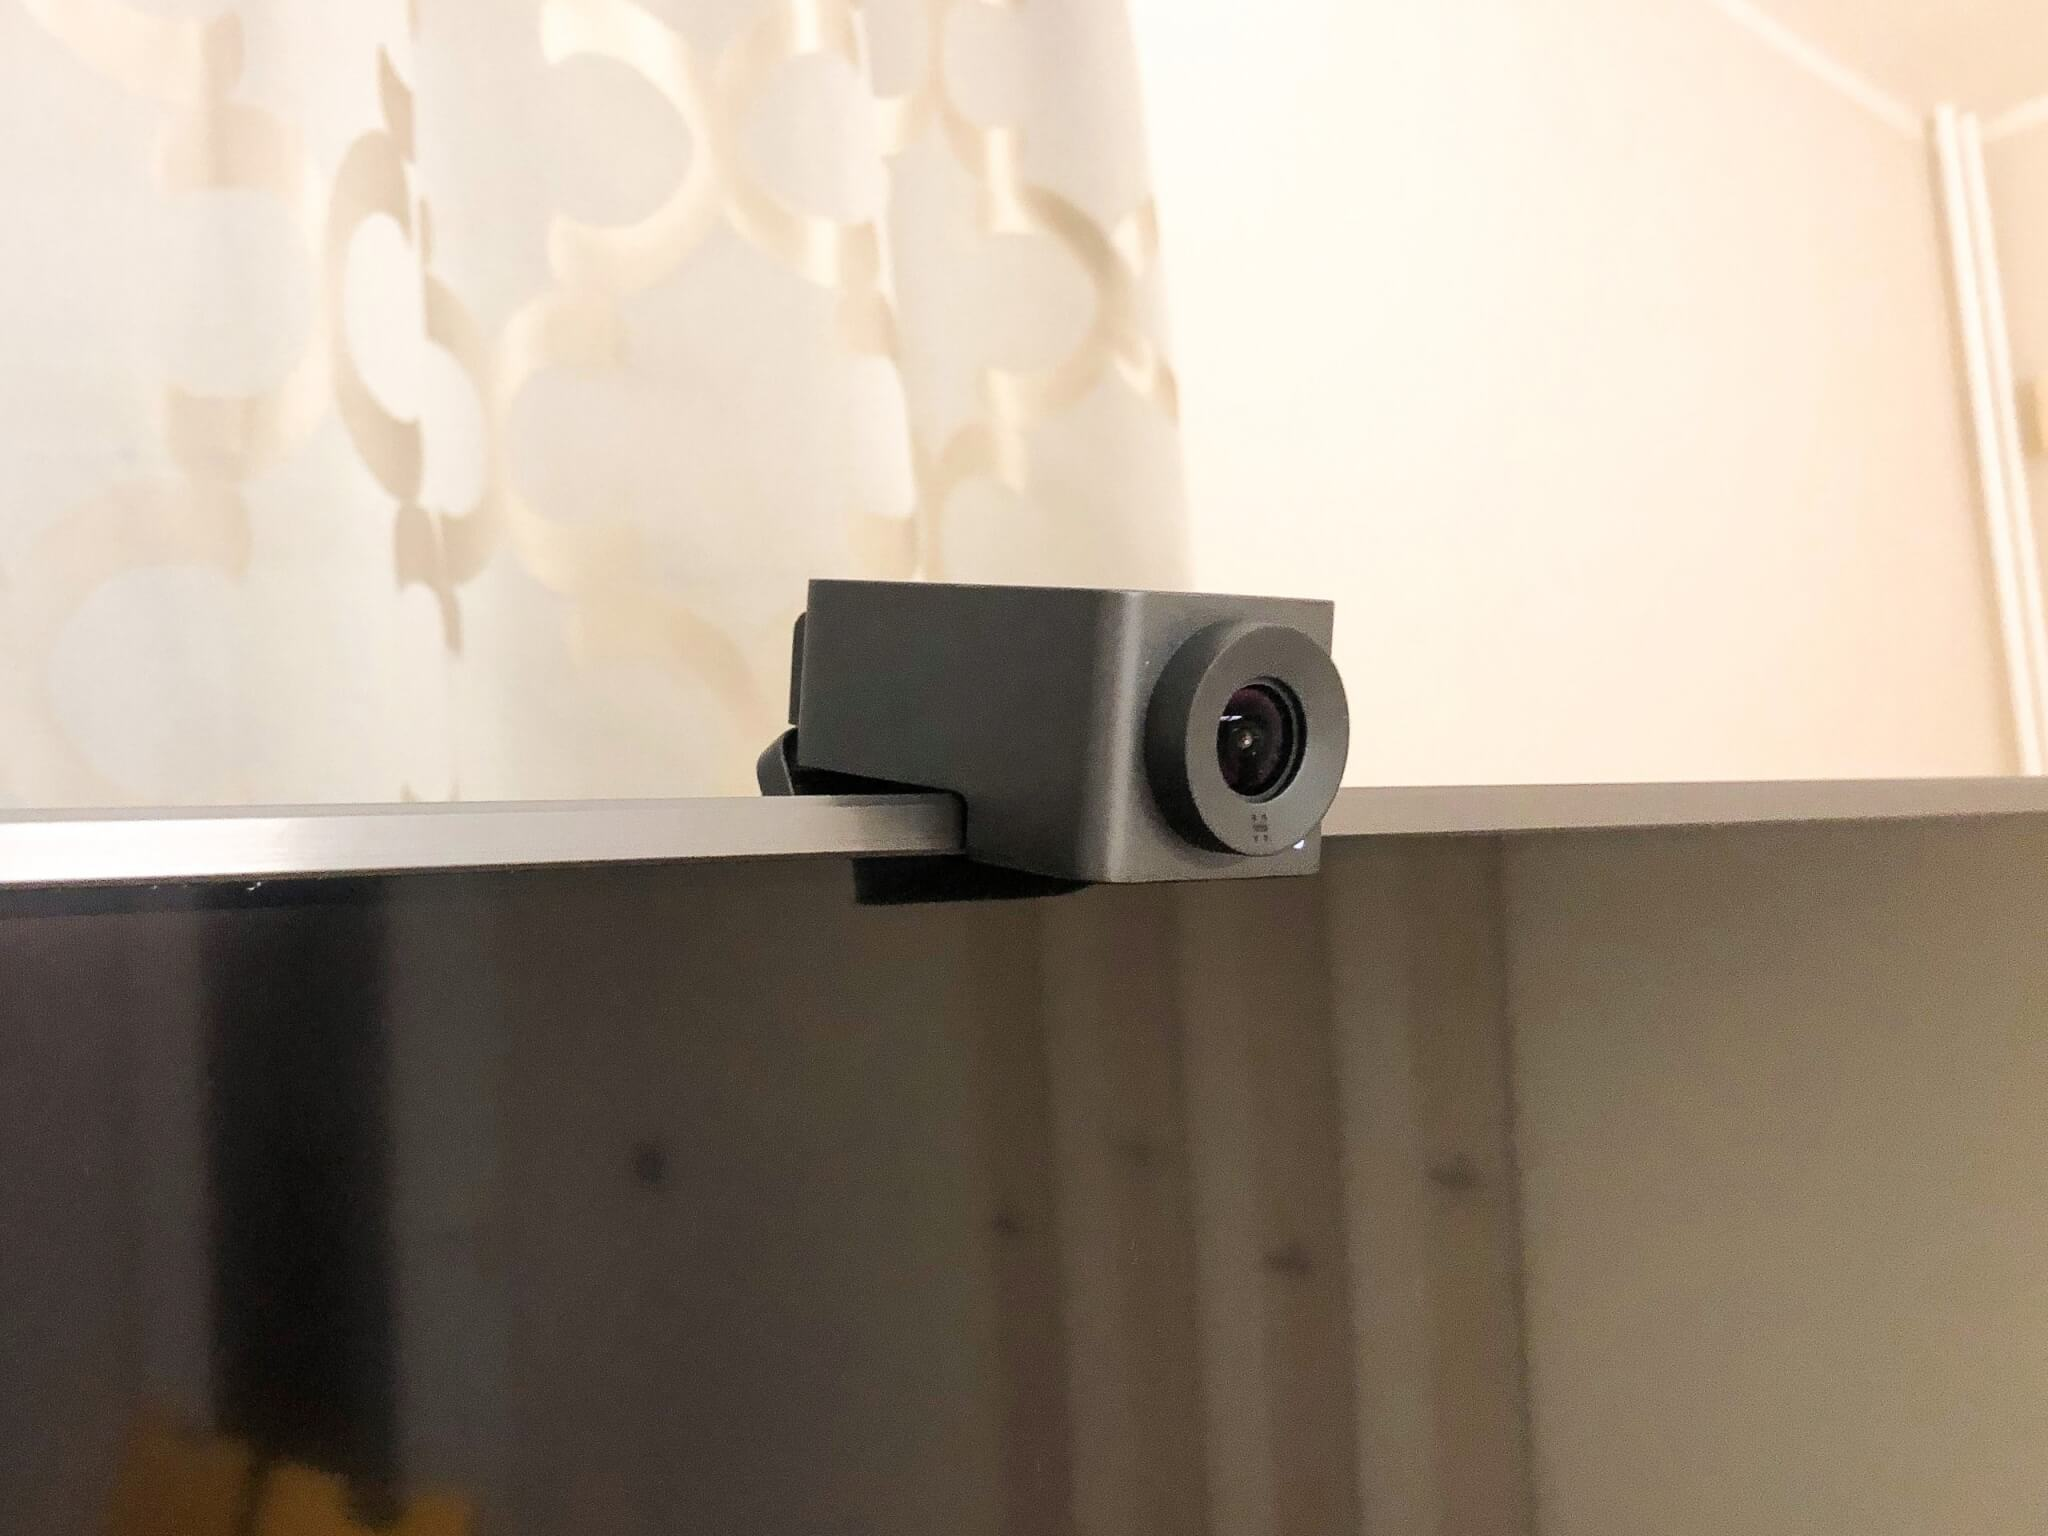 MediaTech-profesionalna-videokonferencna-kamera